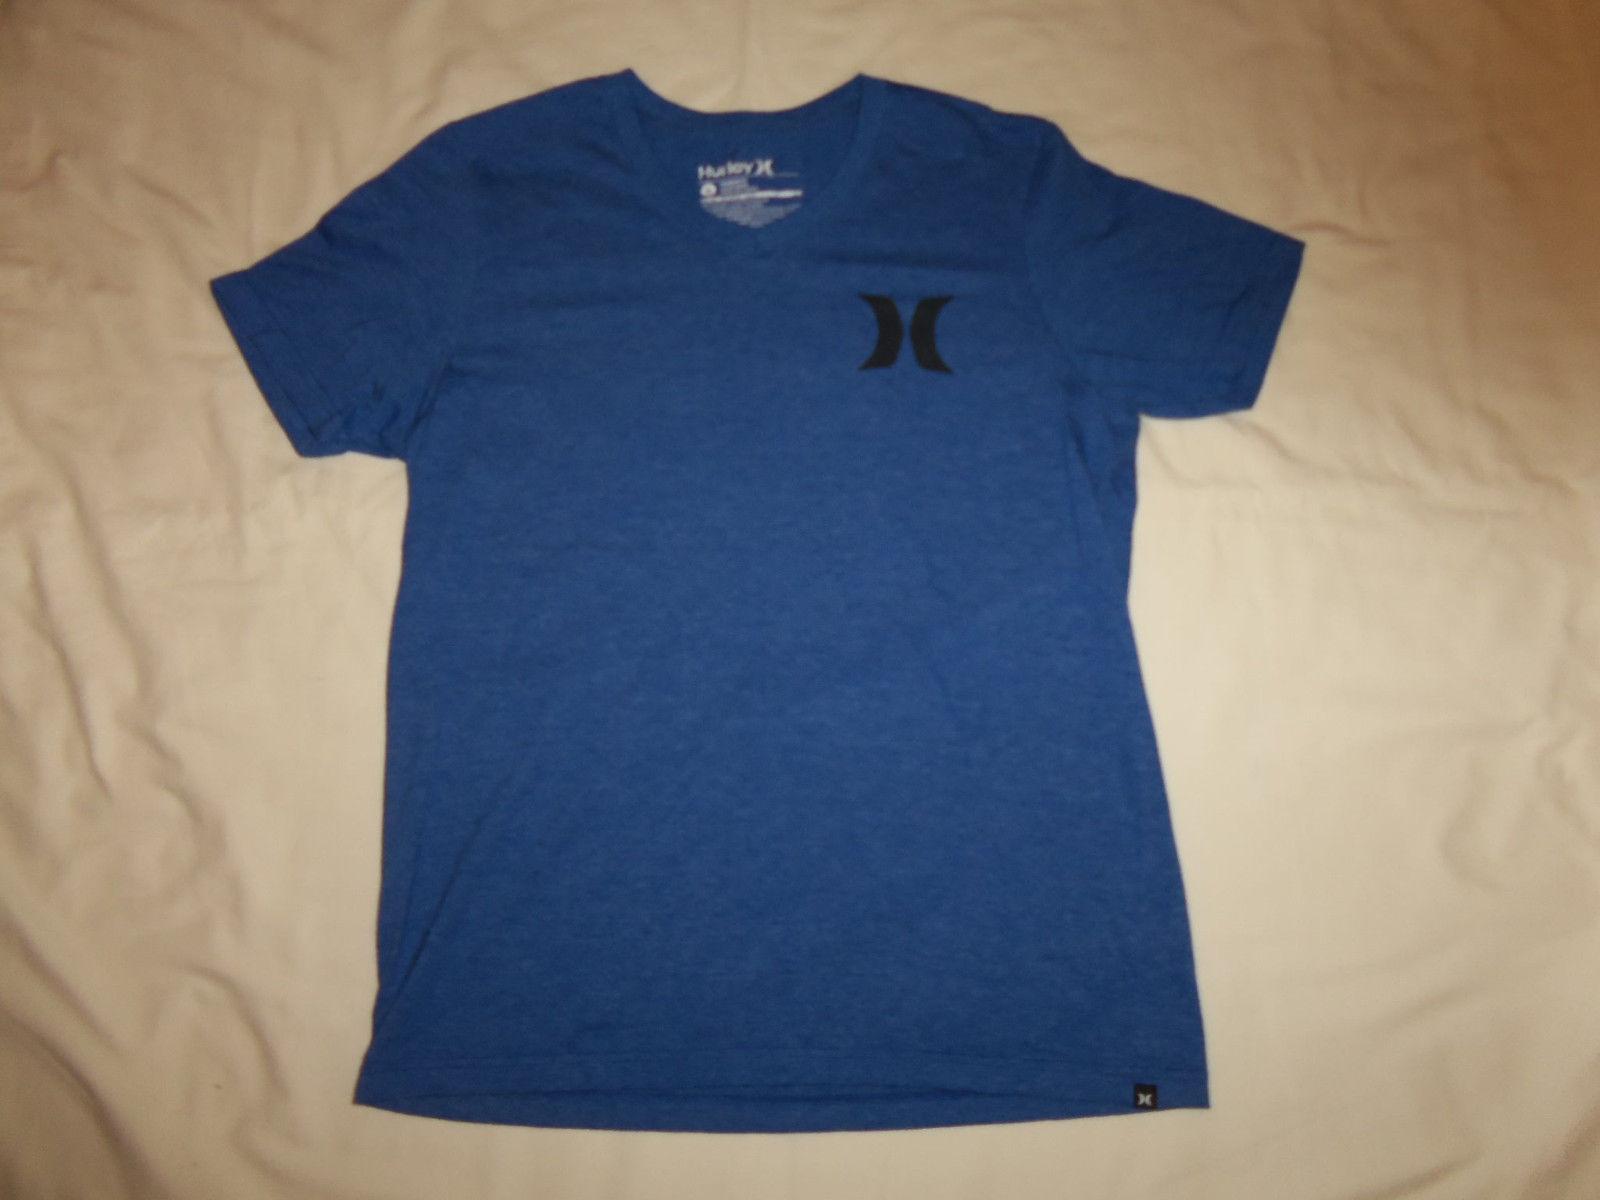 efe8f46f6 ... Hurley Clothing Surf Brand Blue 50/50 Graphic Print T Shirt - M